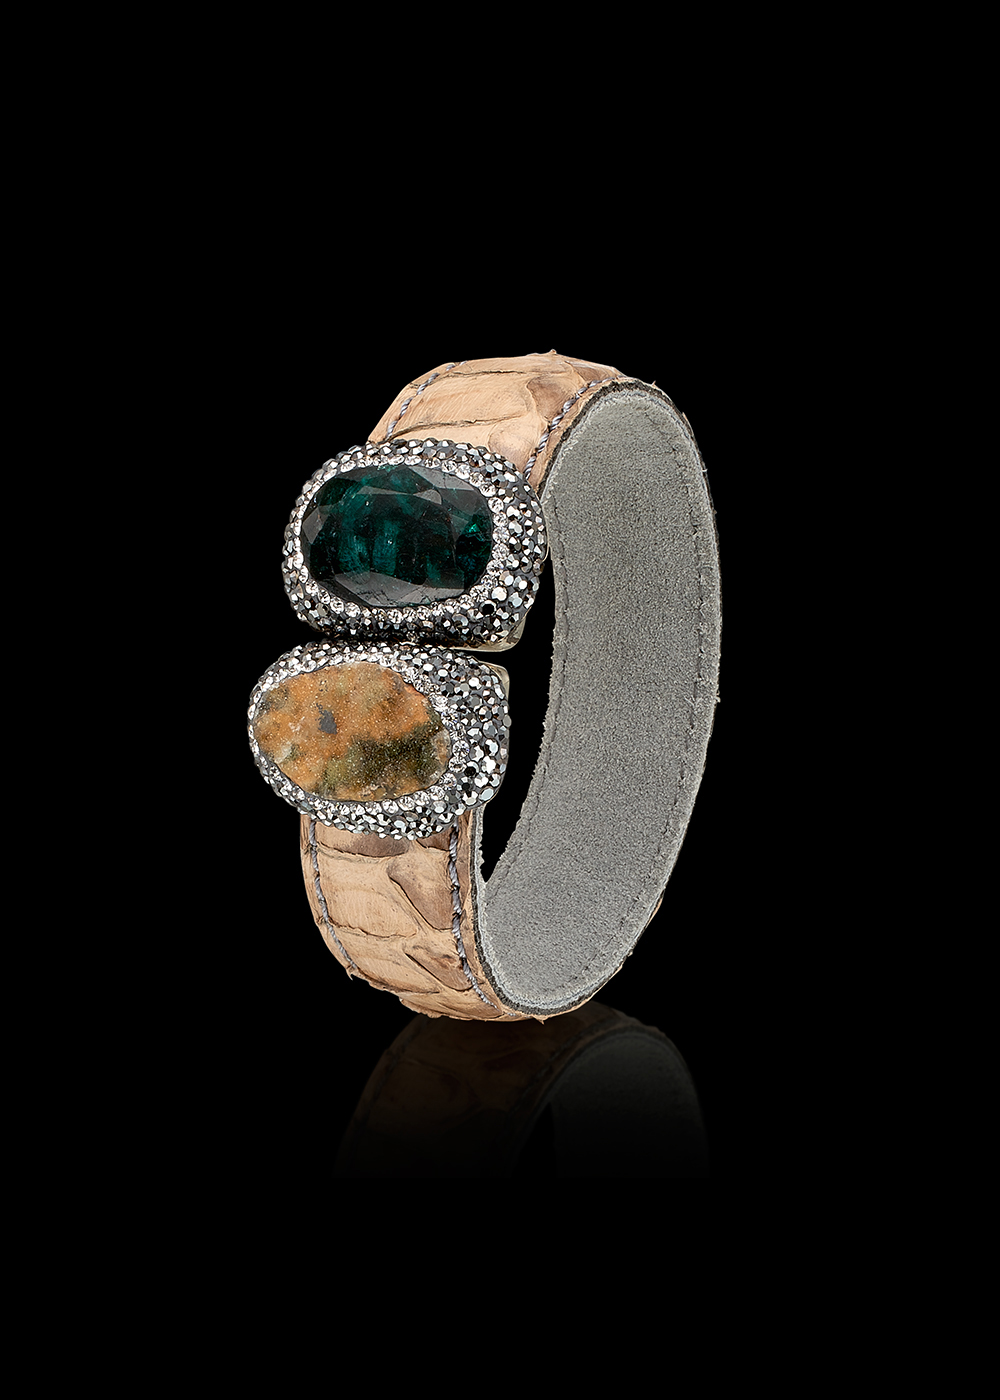 GERONIMO bracelet with Tourmaline, Calcedonia, Swarowski Crystals and Snakeskin